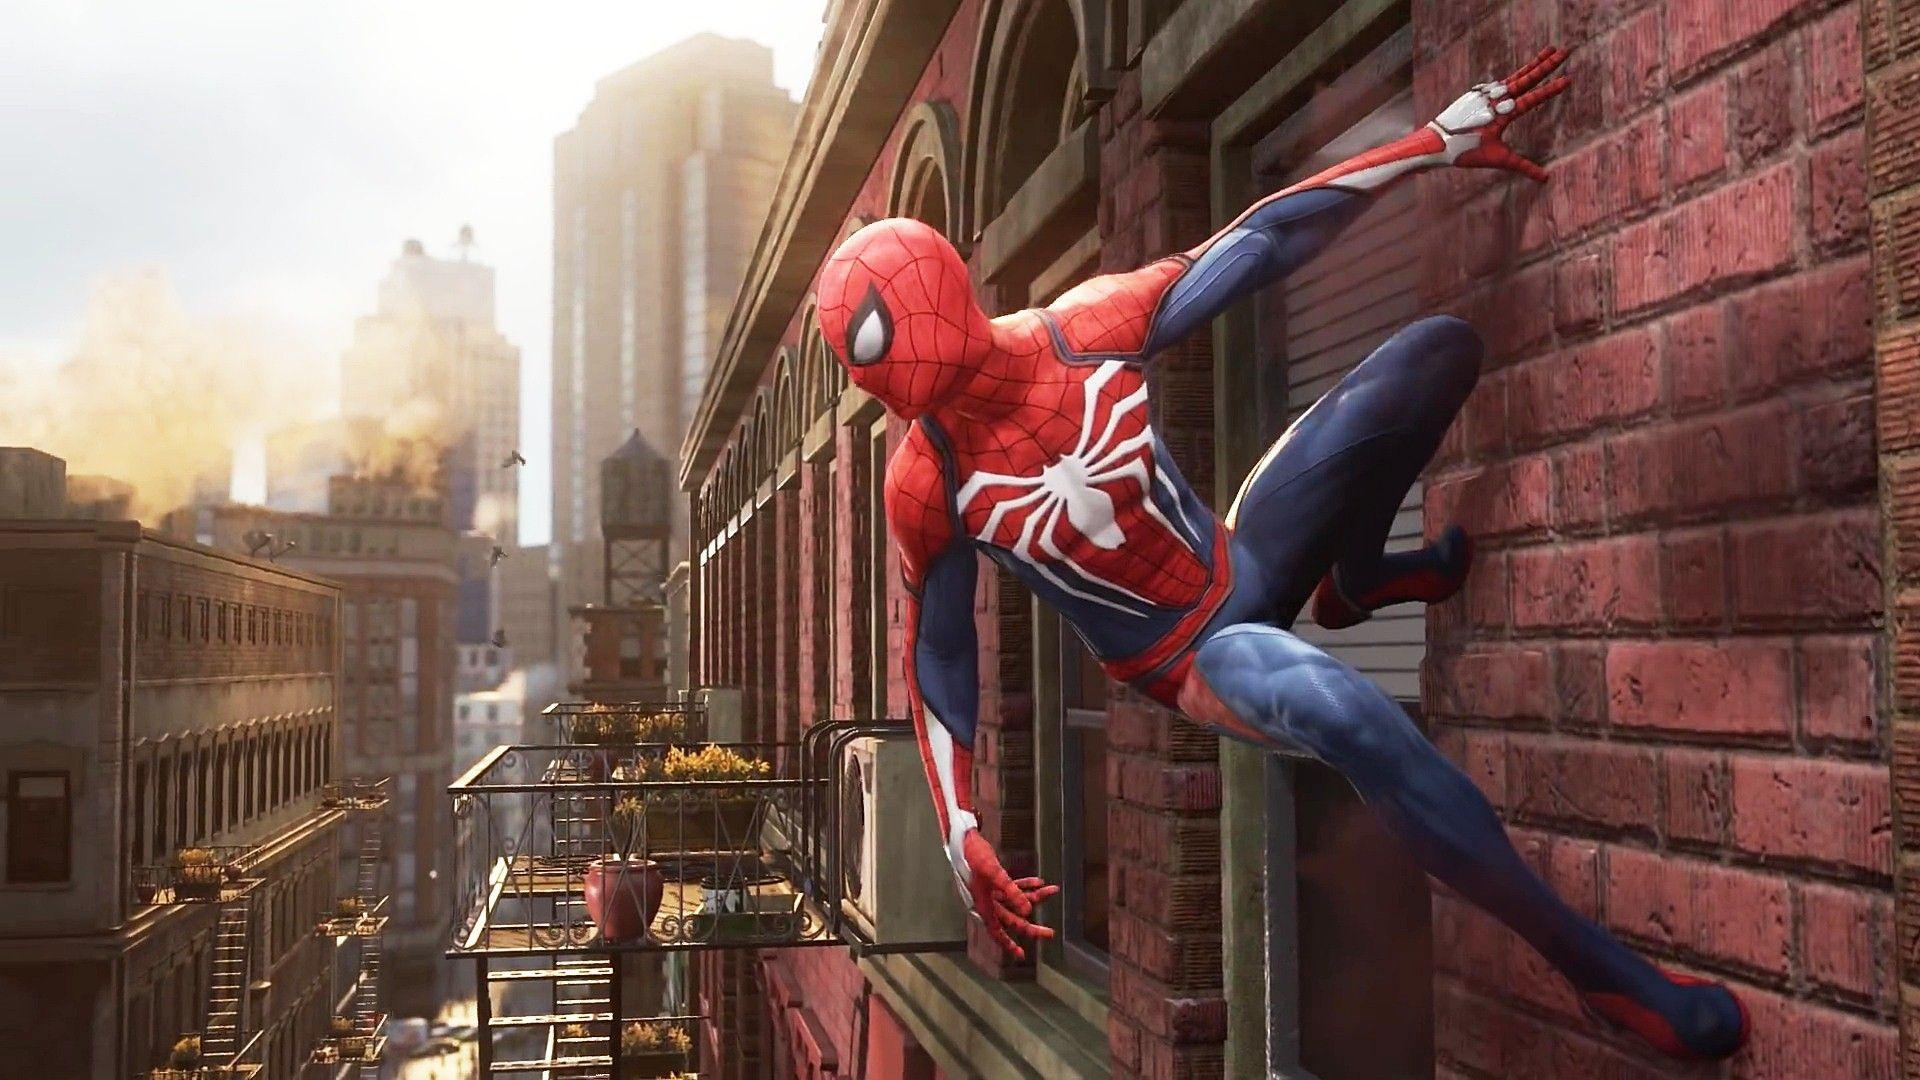 Spiderman 2016 Wallpapers - Wallpaper Cave